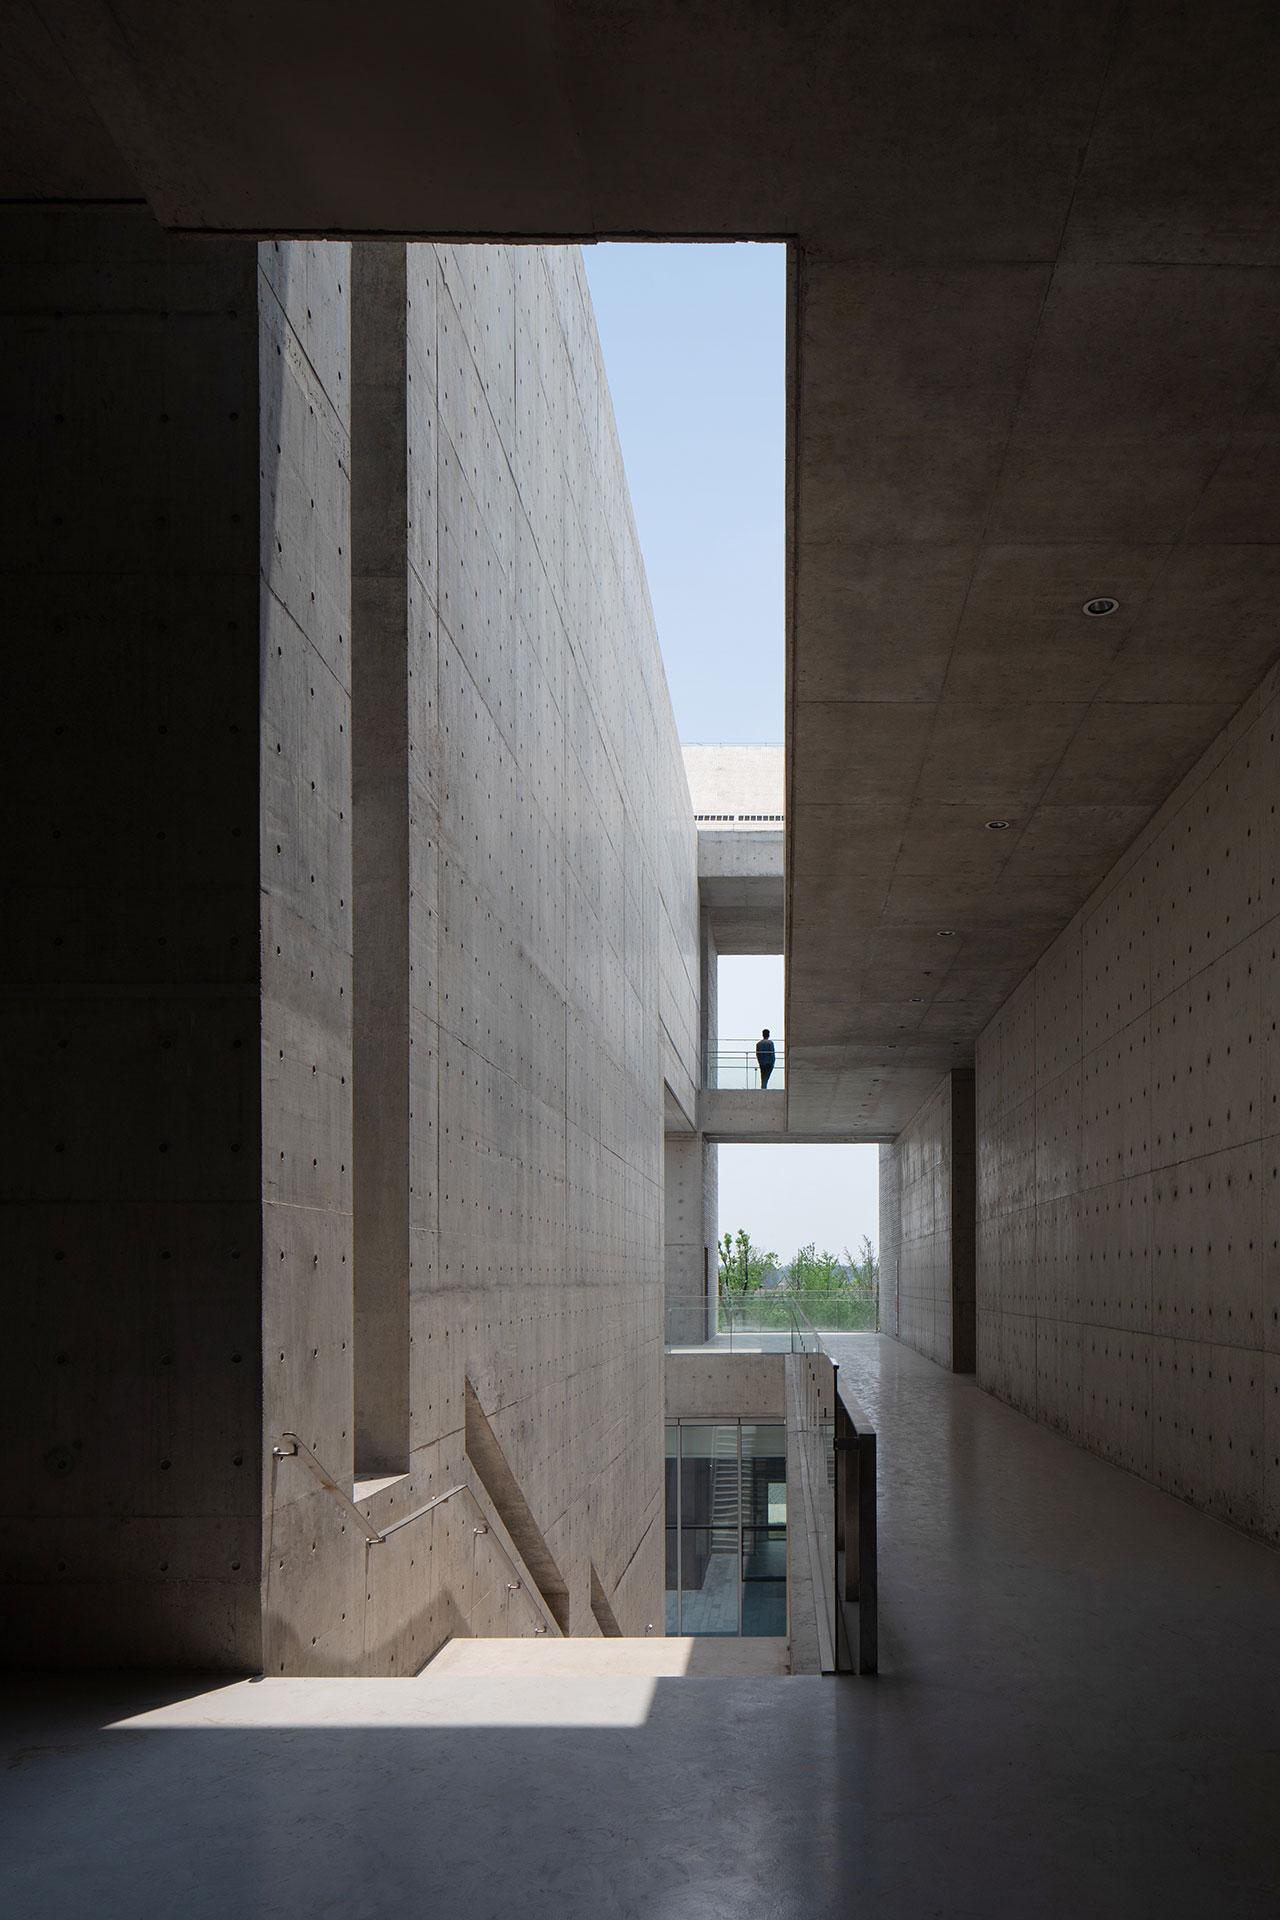 Shou County Culture and Art Center by Studio Zhu-Pei. Photography by Schran Images, courtesy of Studio Zhu-Pei.